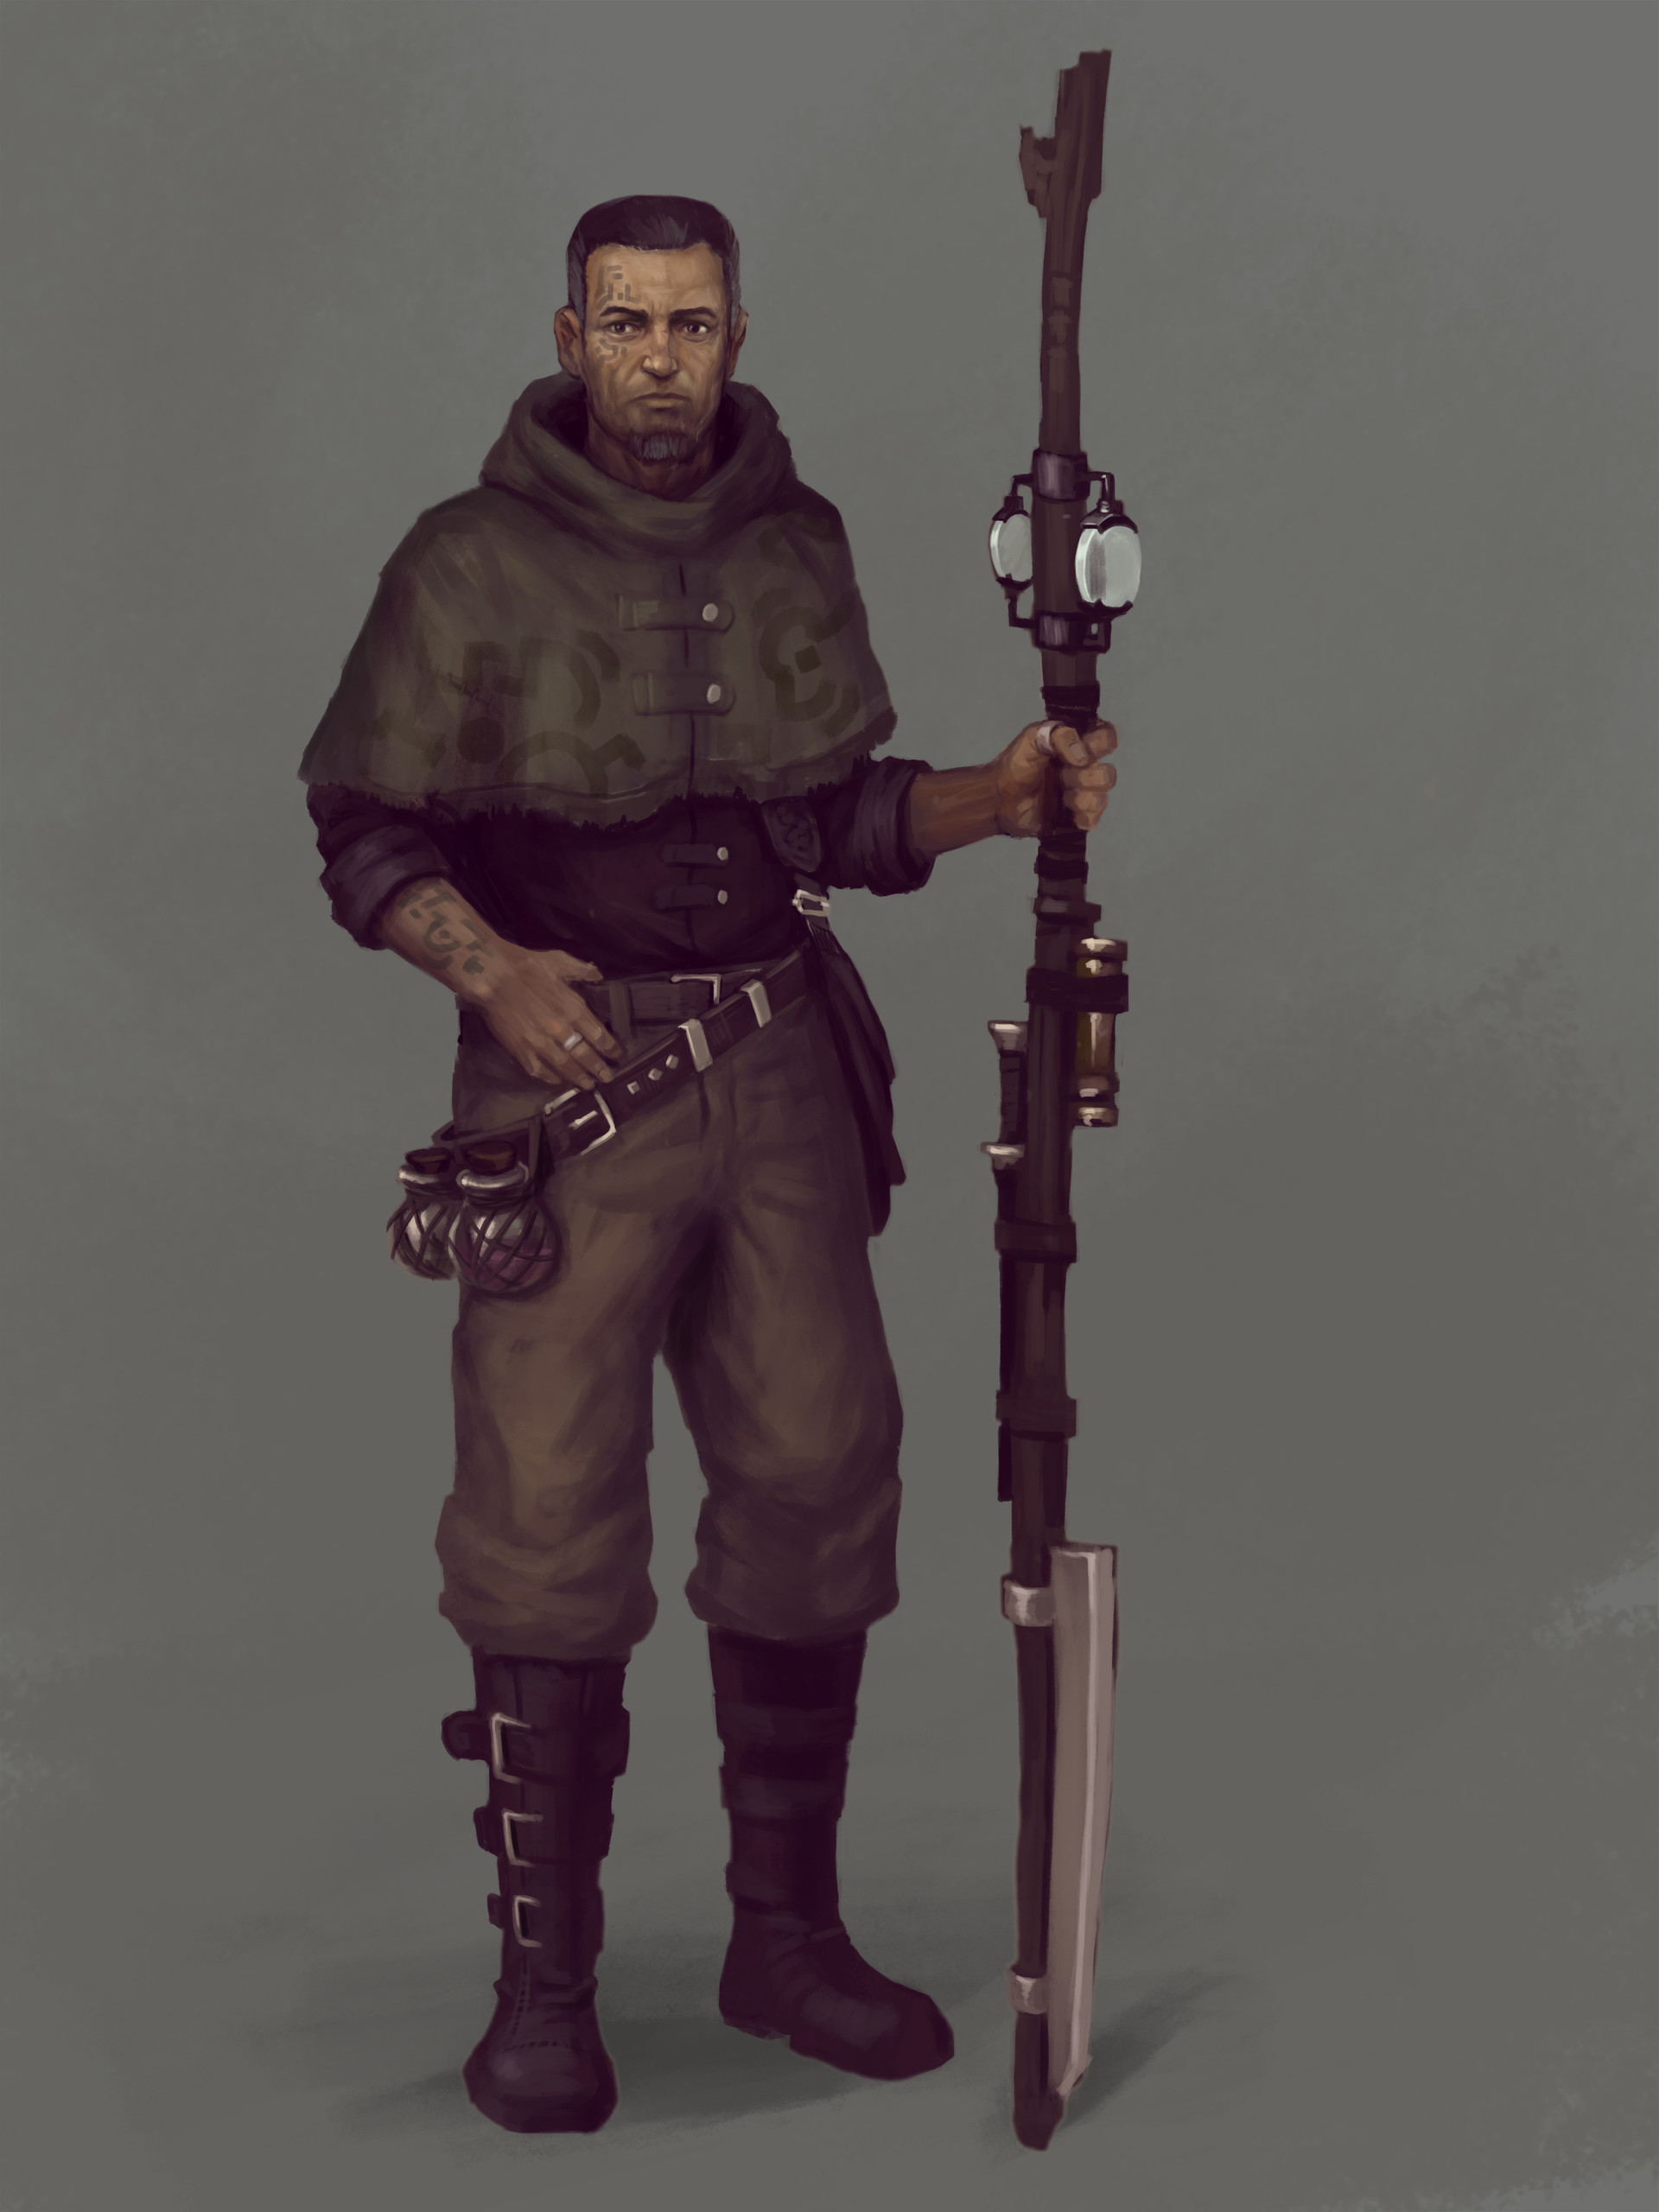 Fredrik dahl woodsman characterdesign final